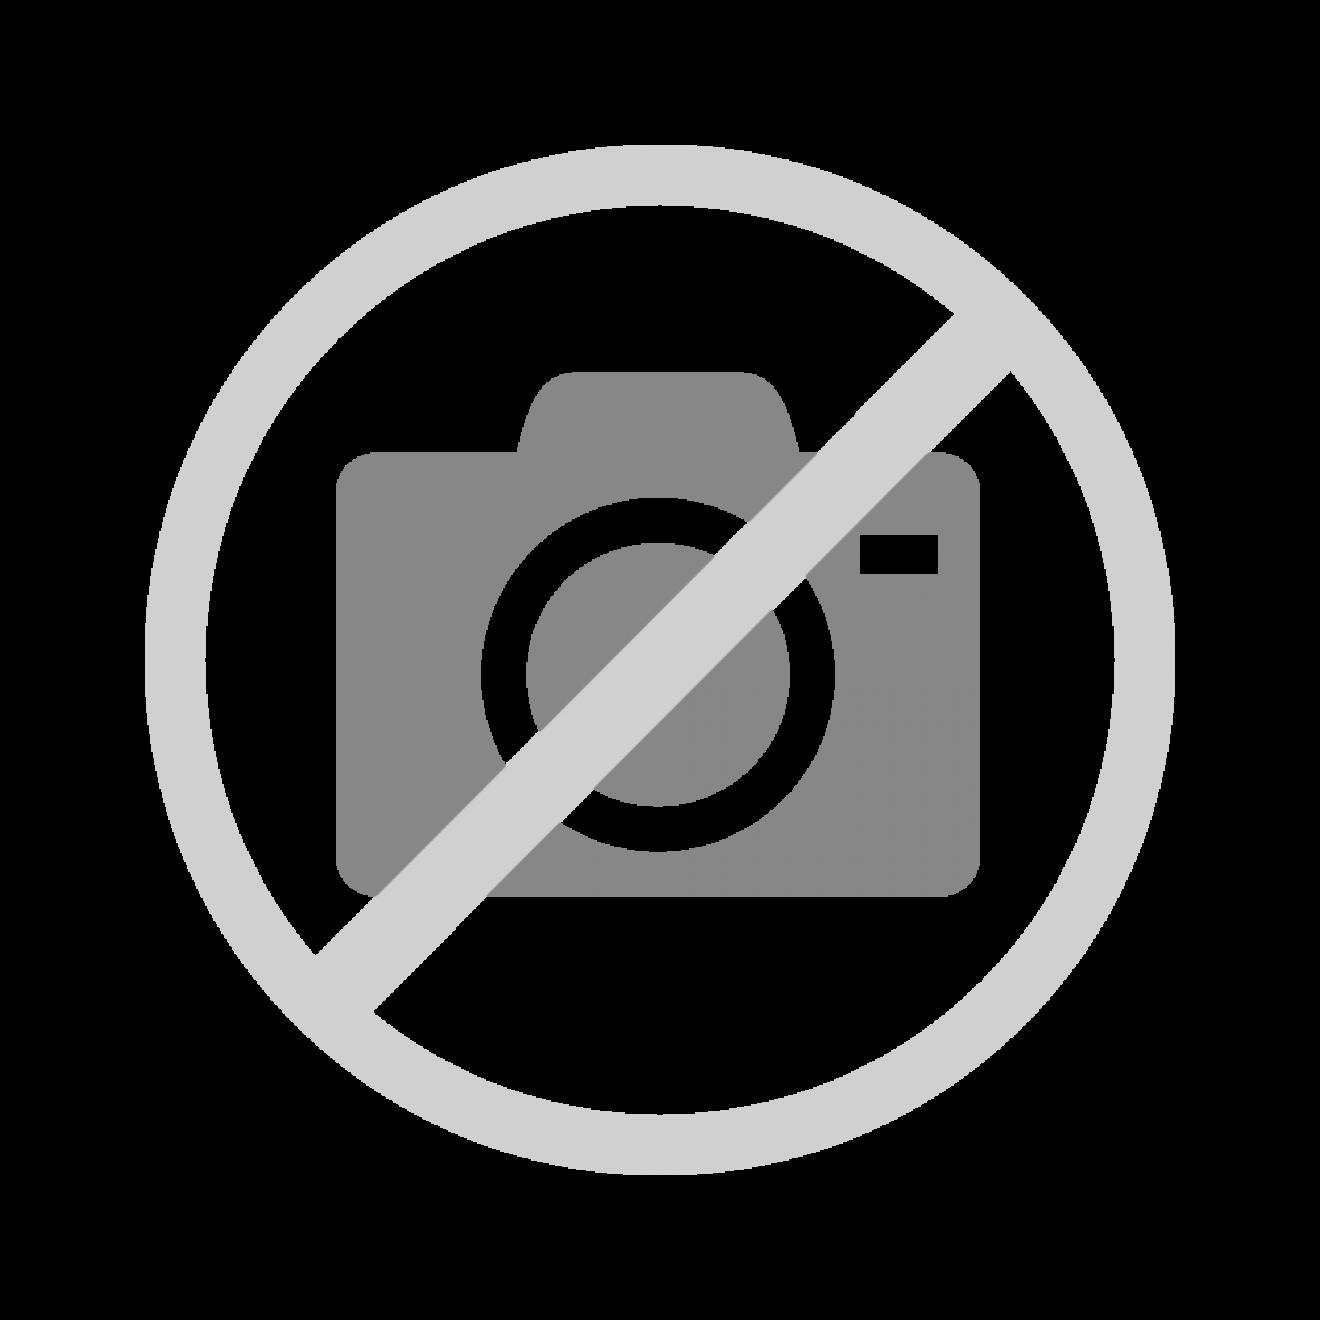 schmiedeeiserne laterne aus marokko jama45. Black Bedroom Furniture Sets. Home Design Ideas